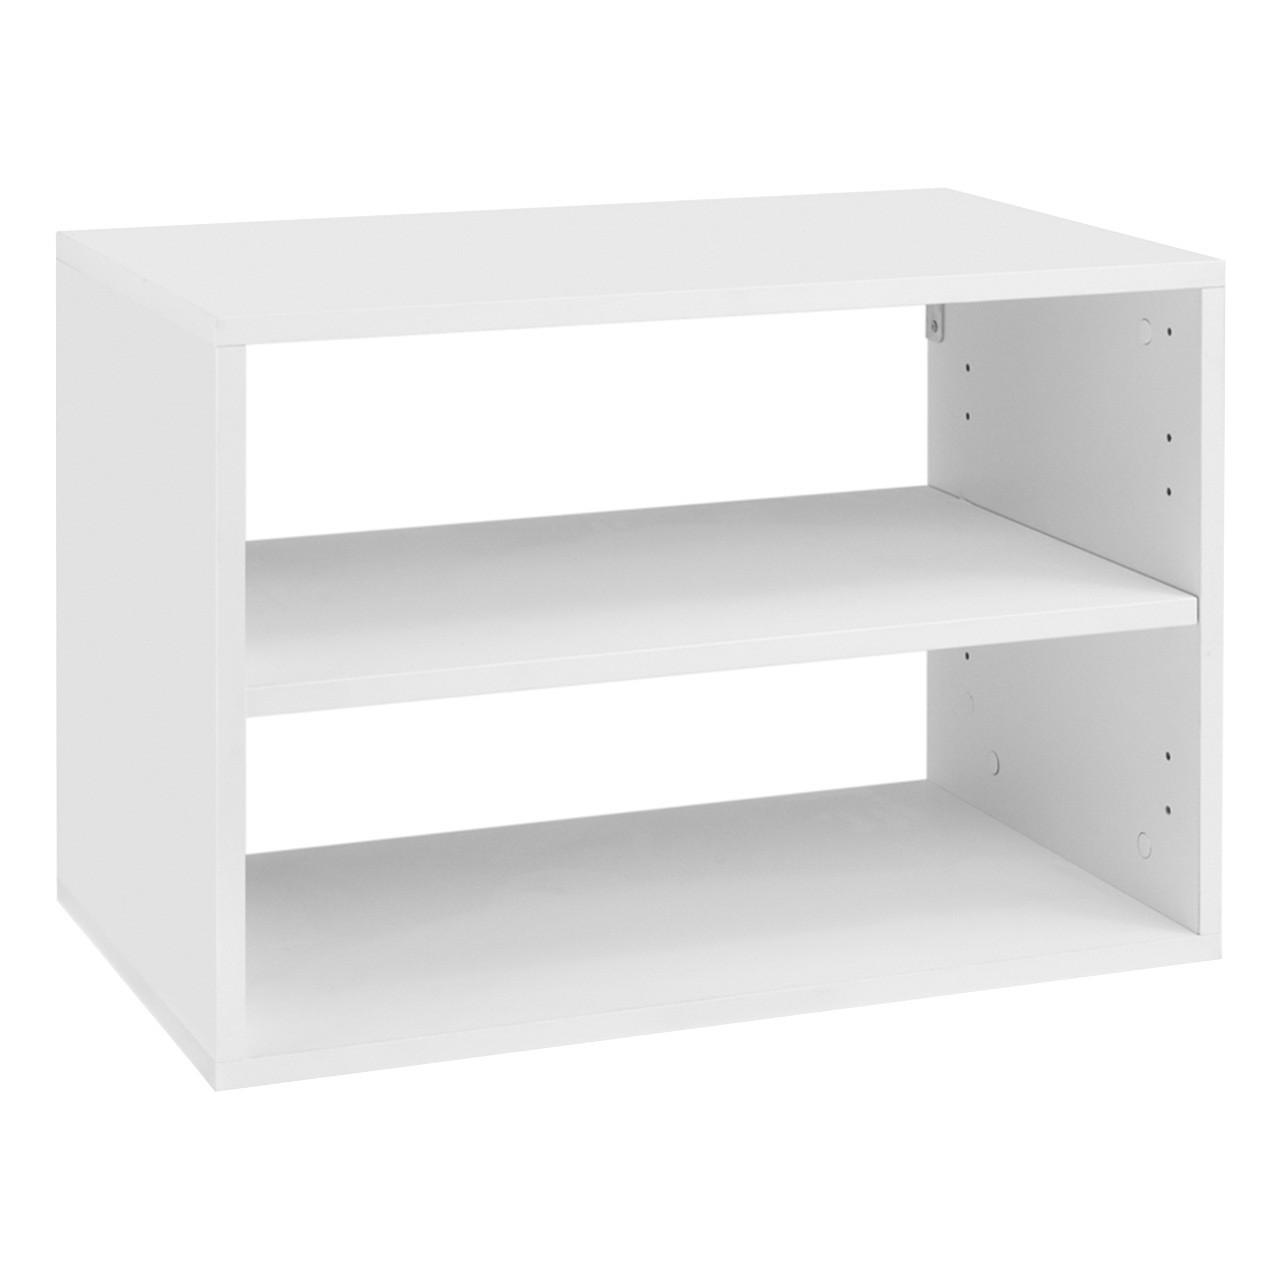 OBox Shelf Unit